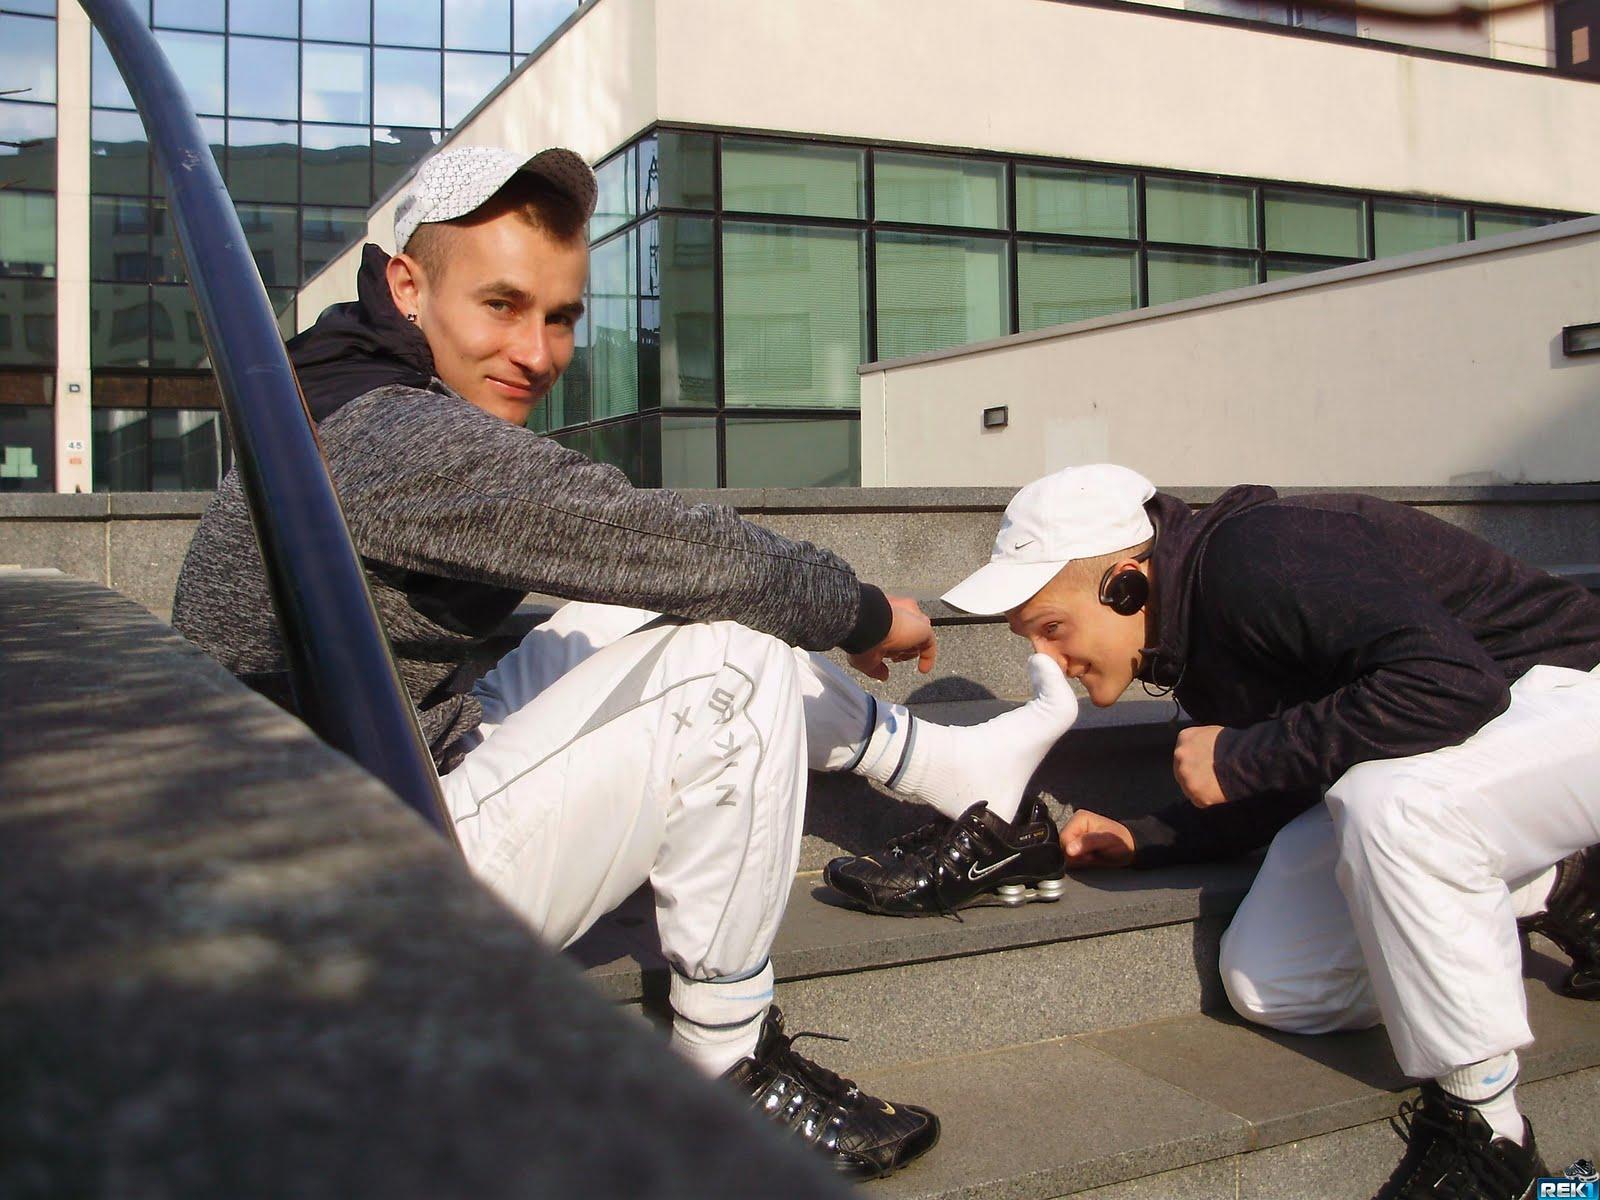 sport mecs pc160084 Dirty gay boys: Sock Washing